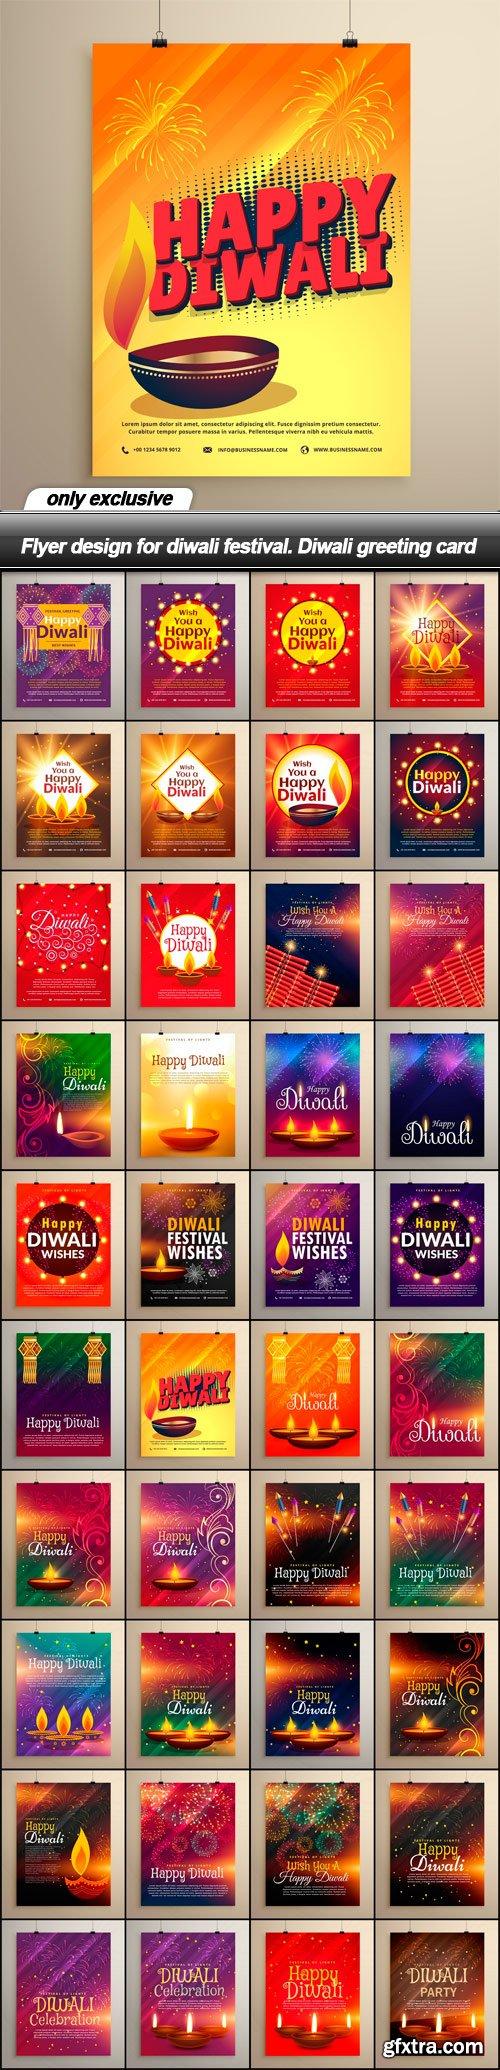 Flyer Design For Diwali Festival Diwali Greeting Card 40 Eps